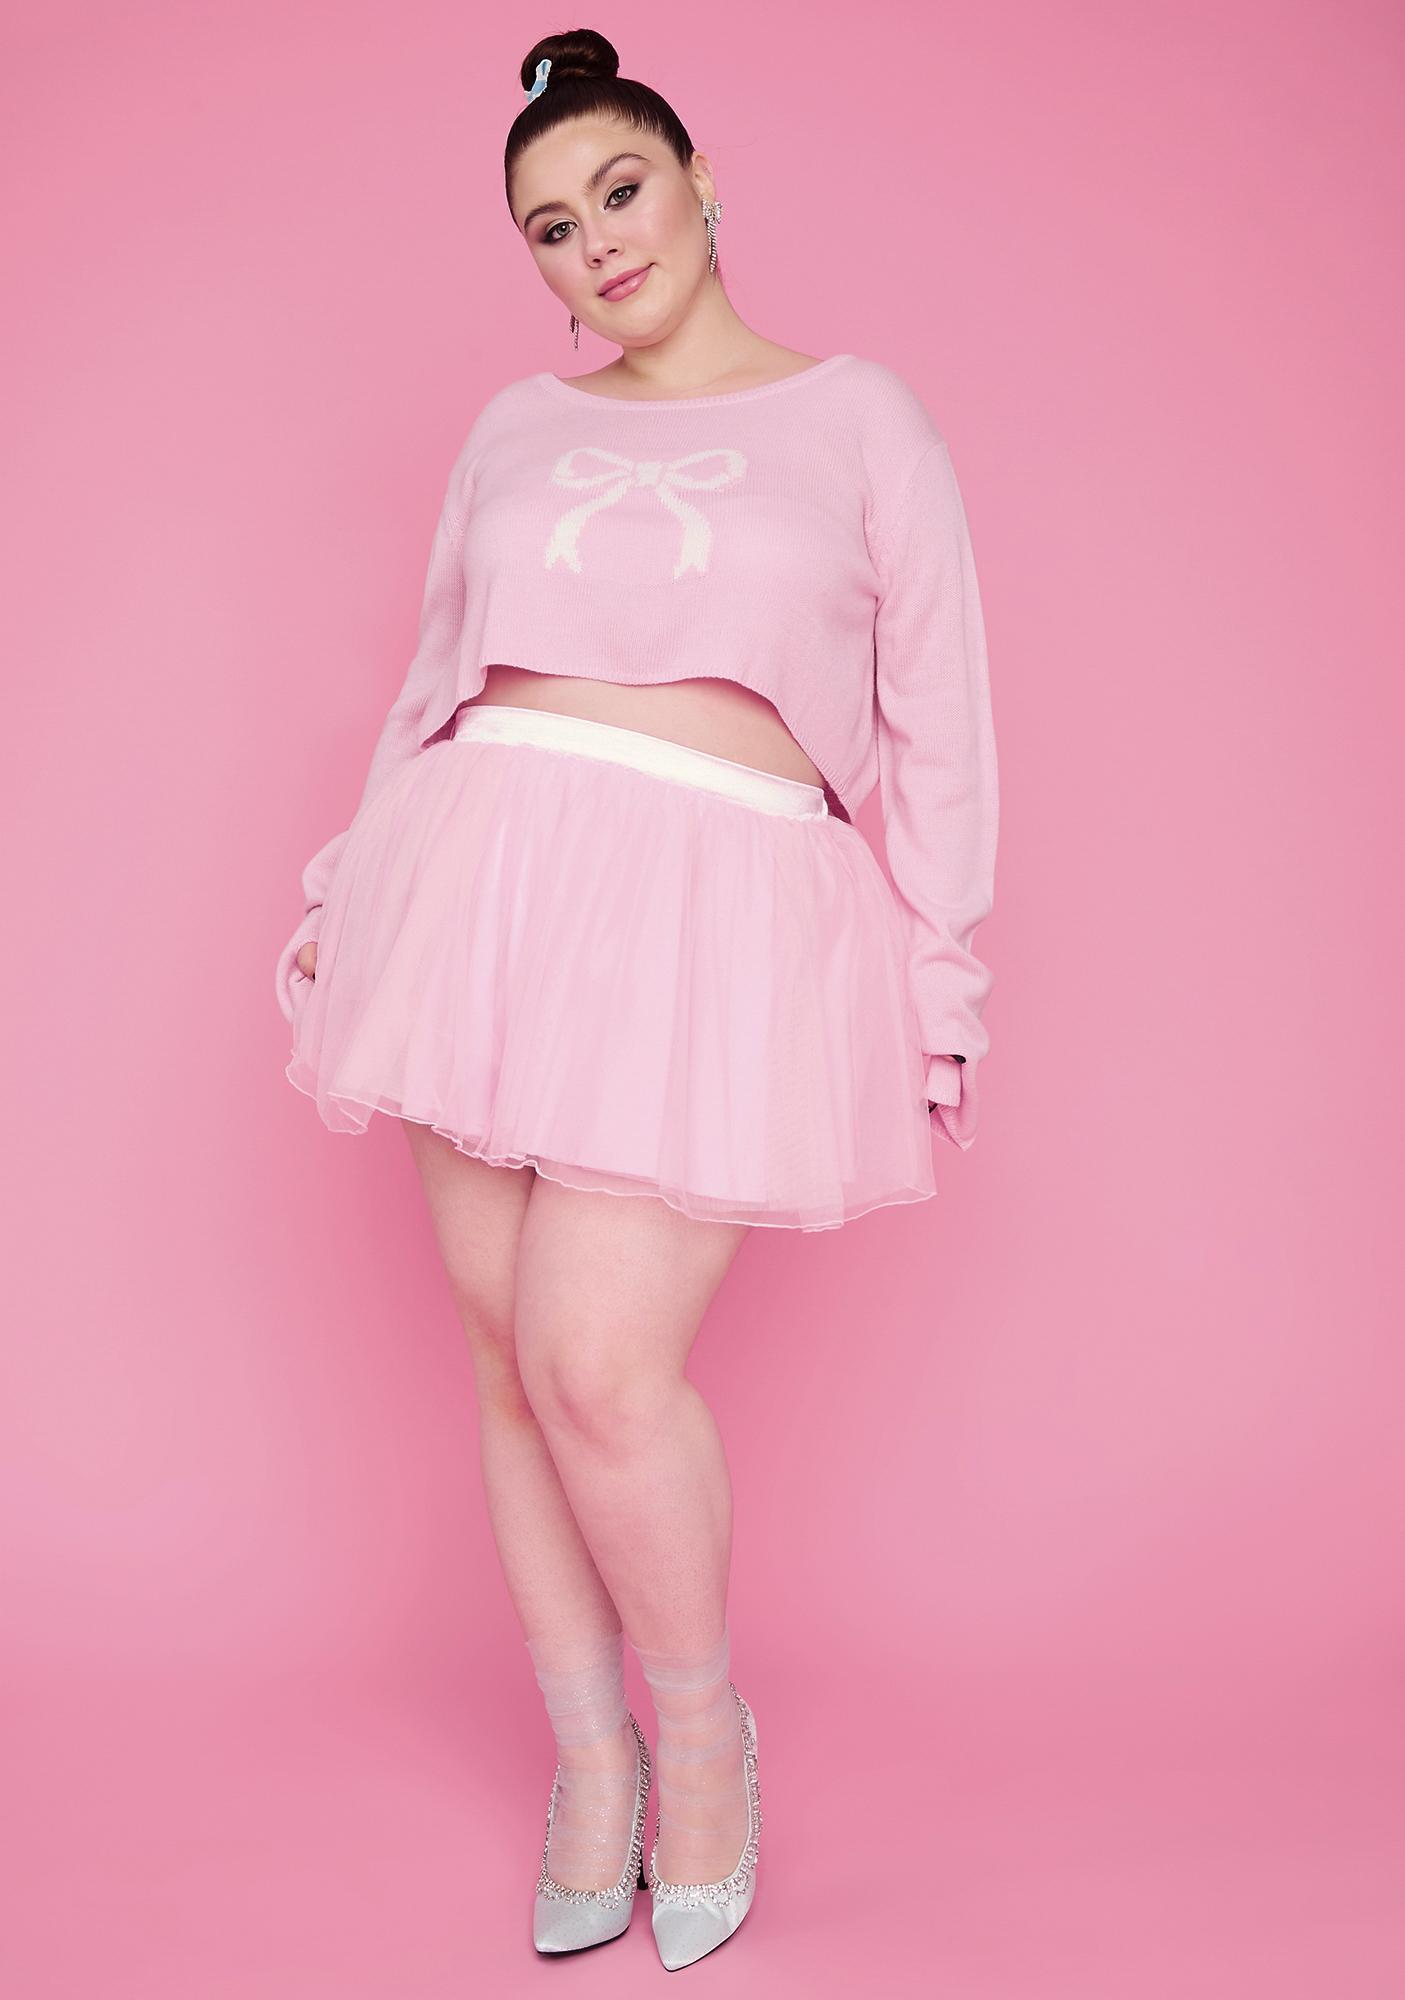 Sugar Thrillz Truly Precious Pirouettes Crop Sweater